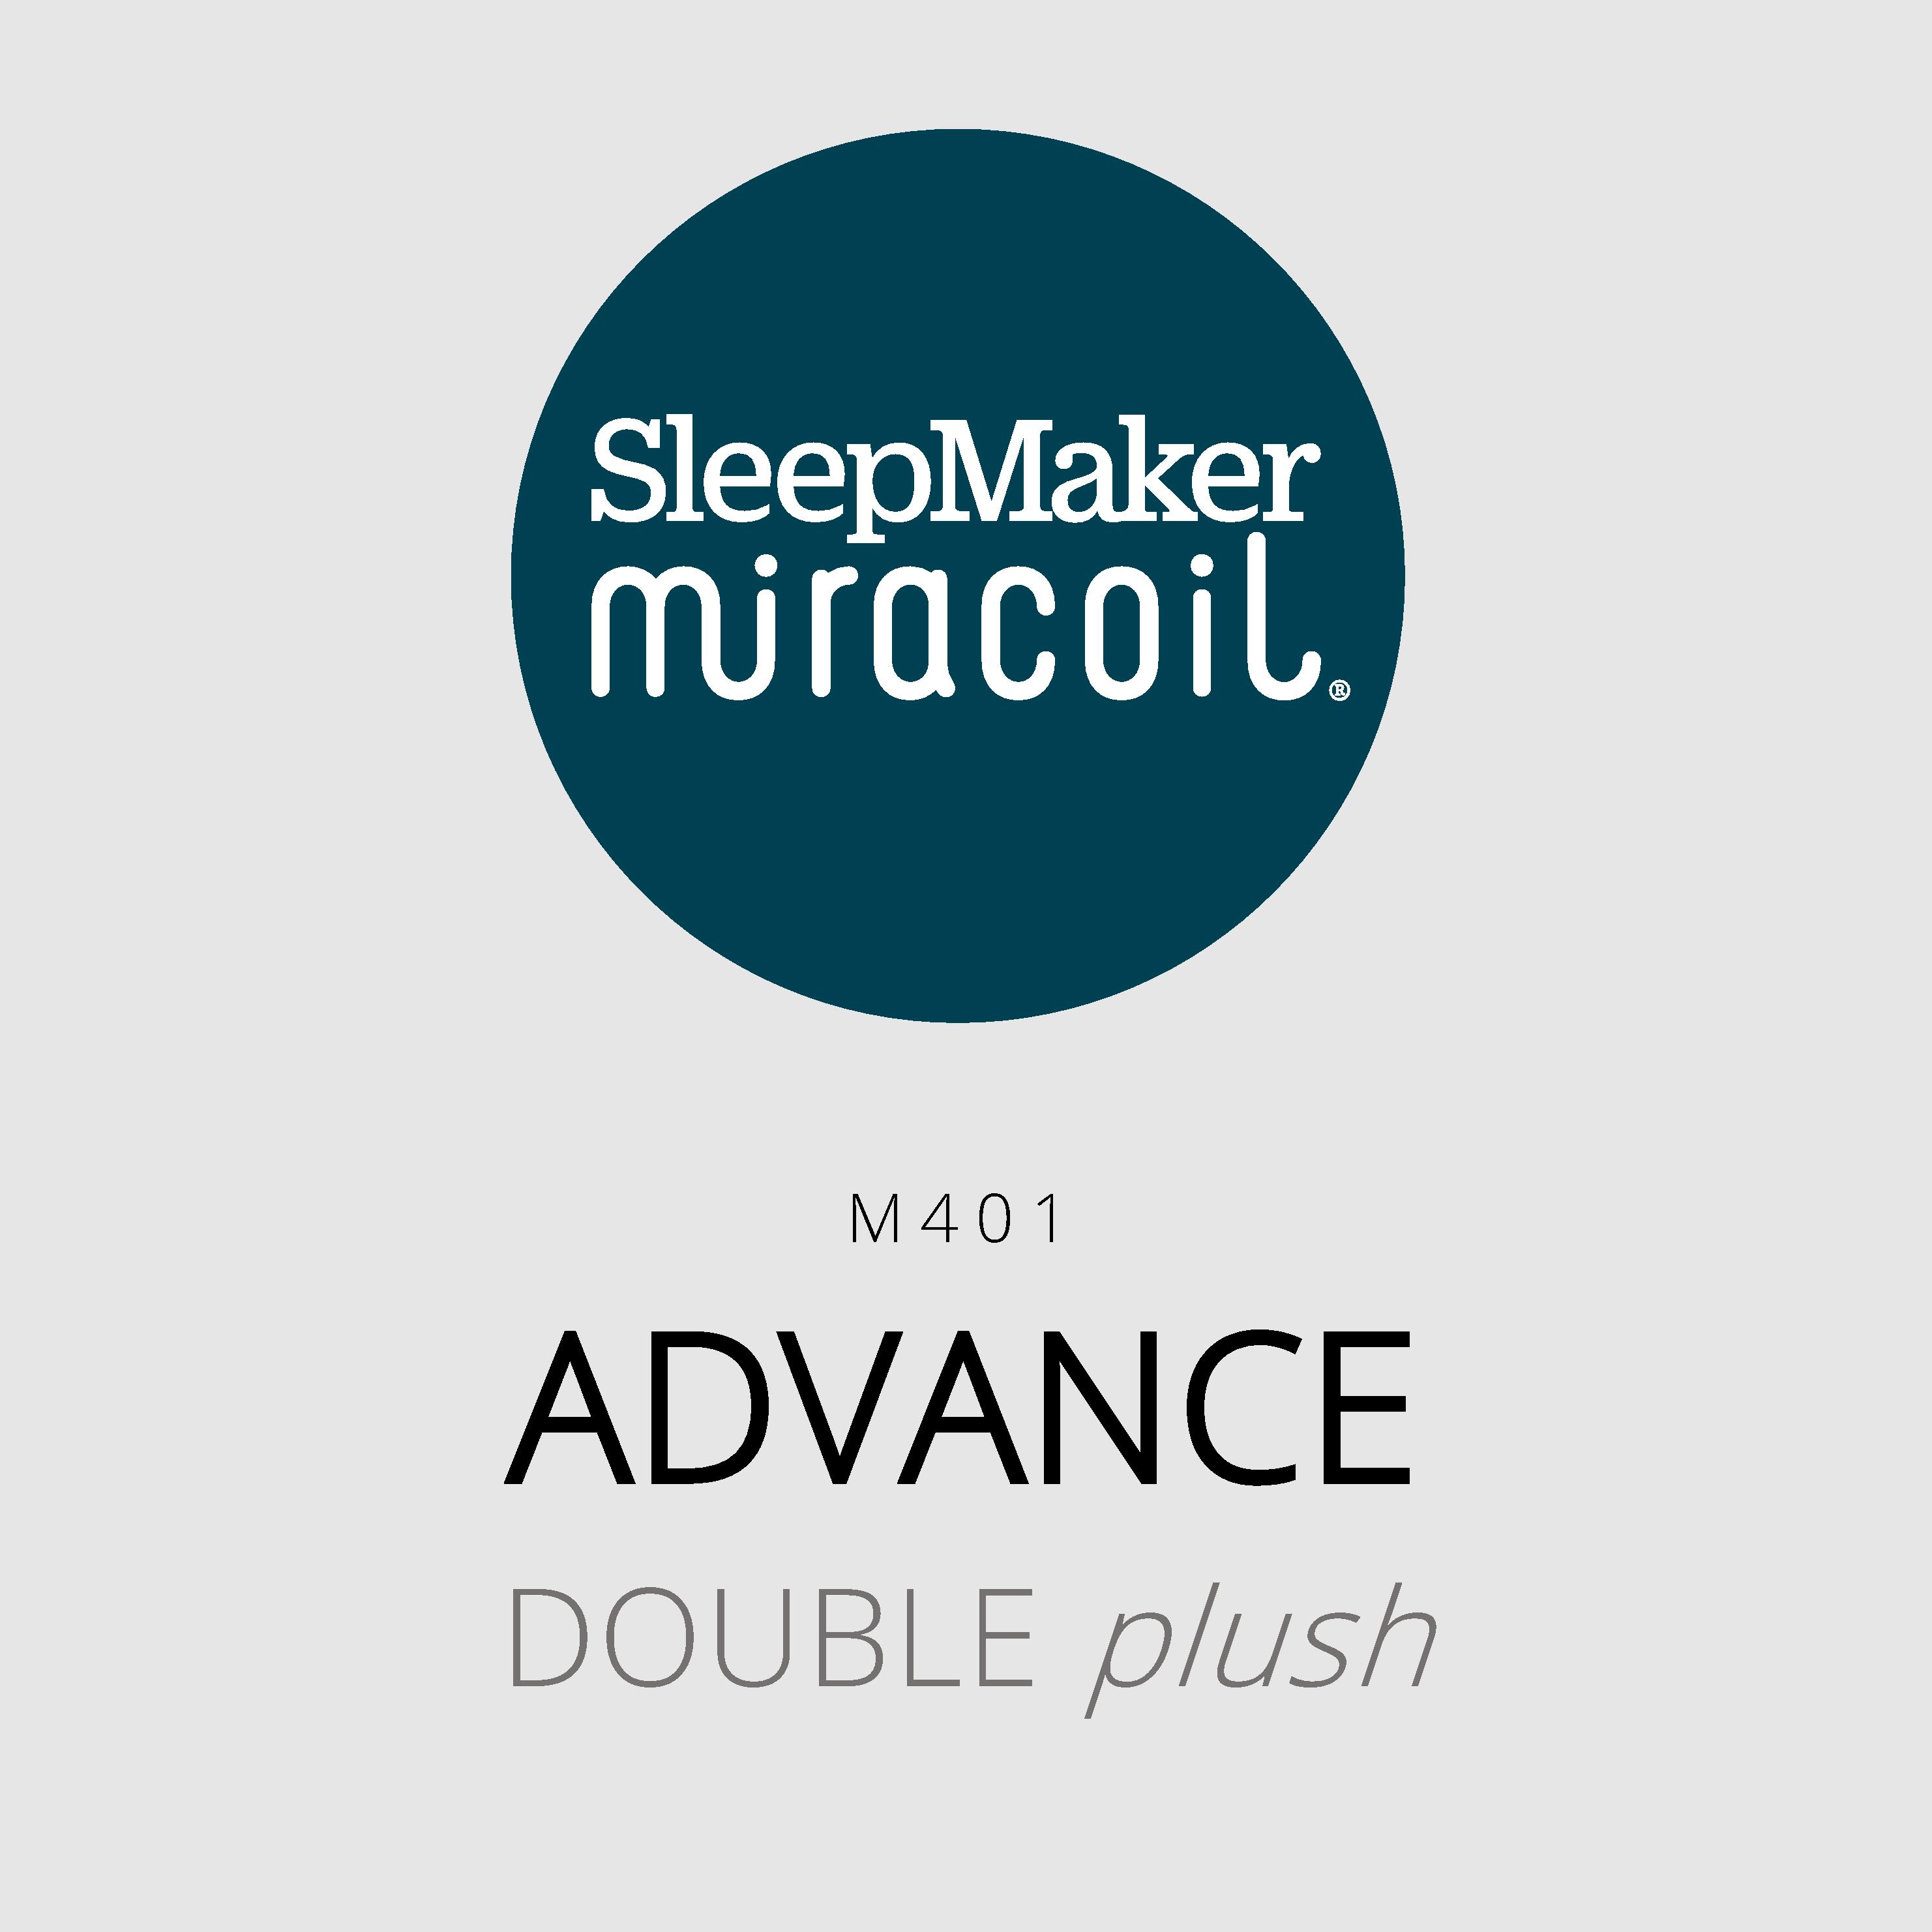 SleepMaker Miracoil – Advance – M401 – Double Plush Mattress